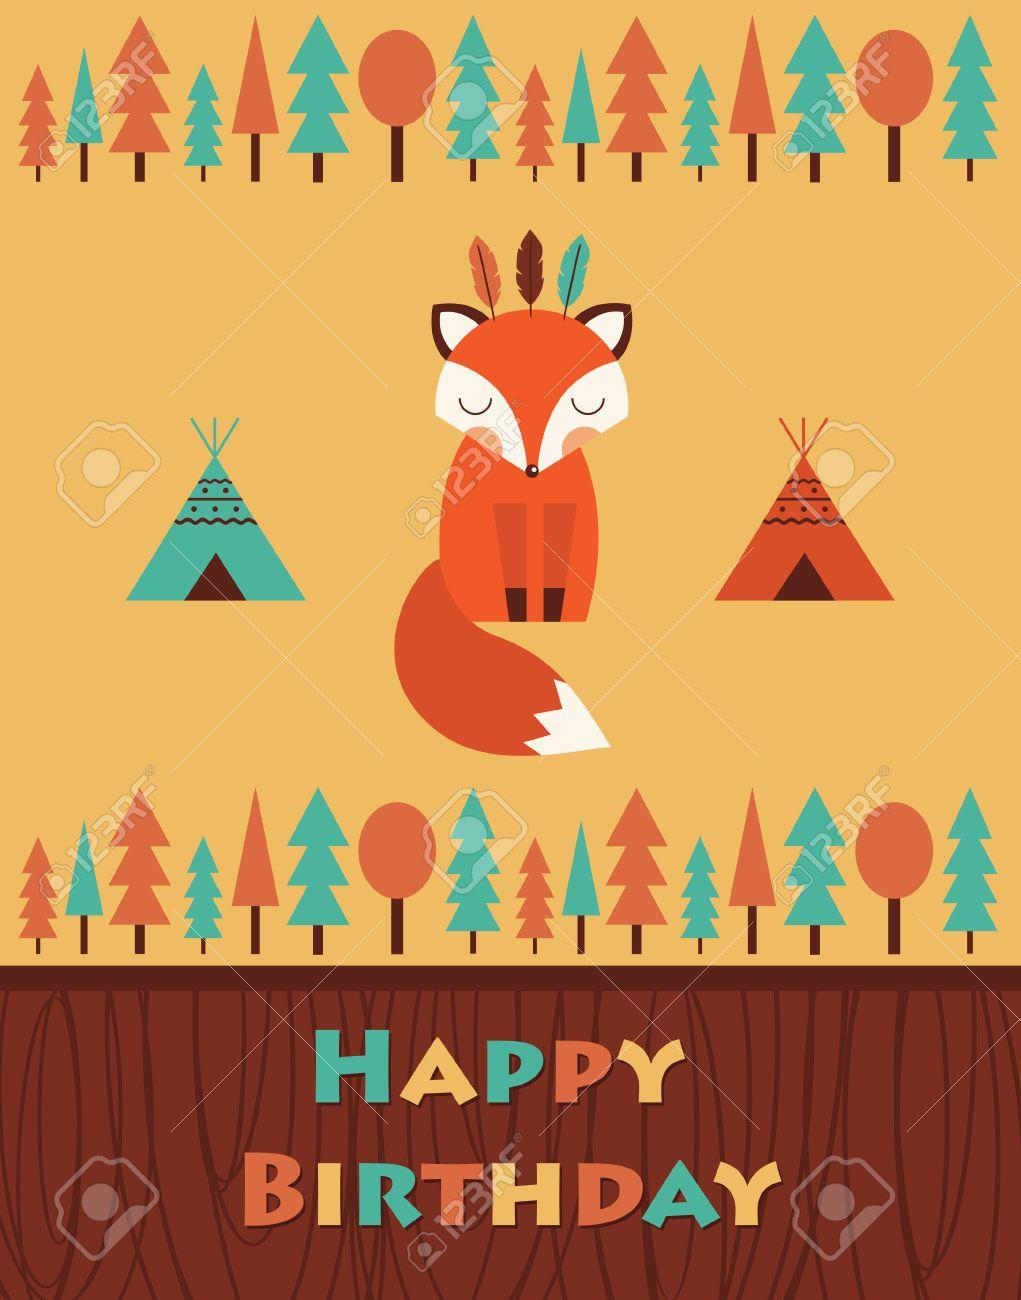 Happy Birthday Card With Cute Fox Vector Illustration Royalty – Happy Birthday Cards Cute